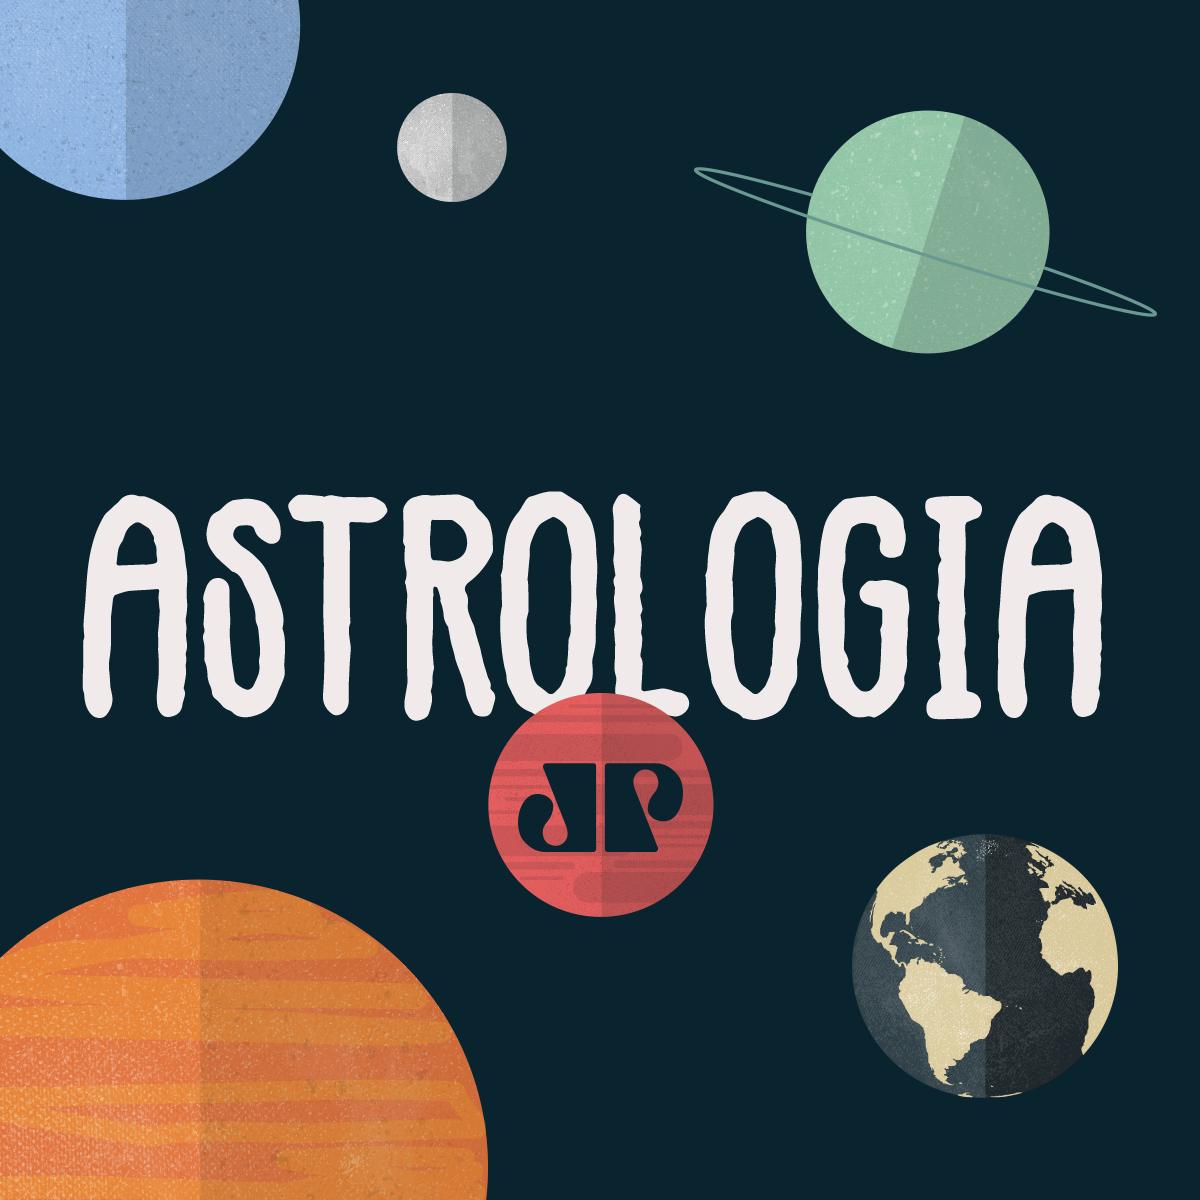 Astrologia JP